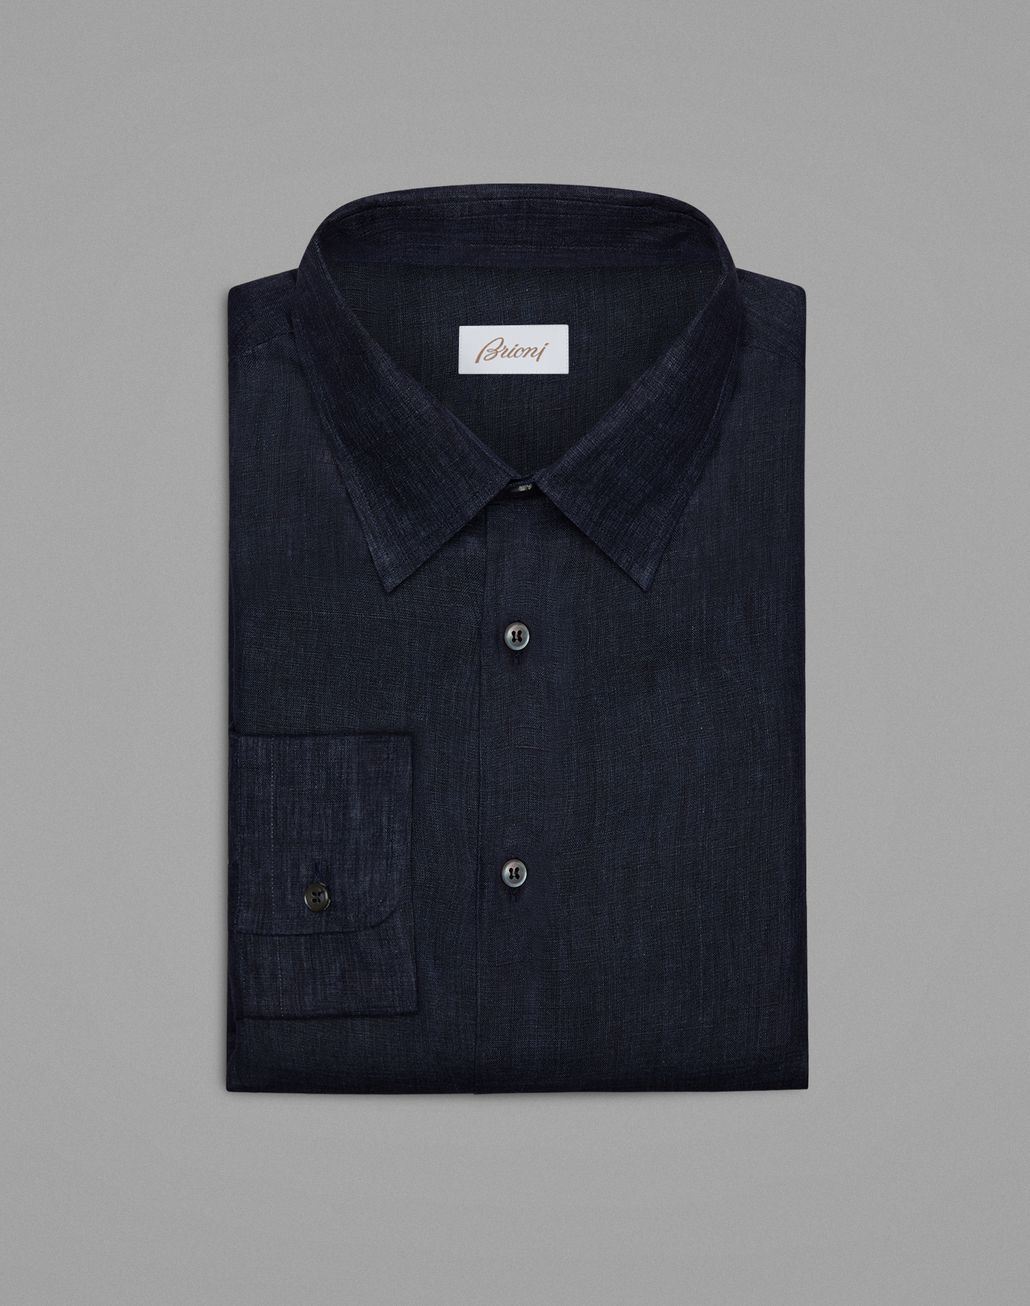 BRIONI Тёмно-синяя льняная рубашка Повседневная рубашка Для Мужчин f